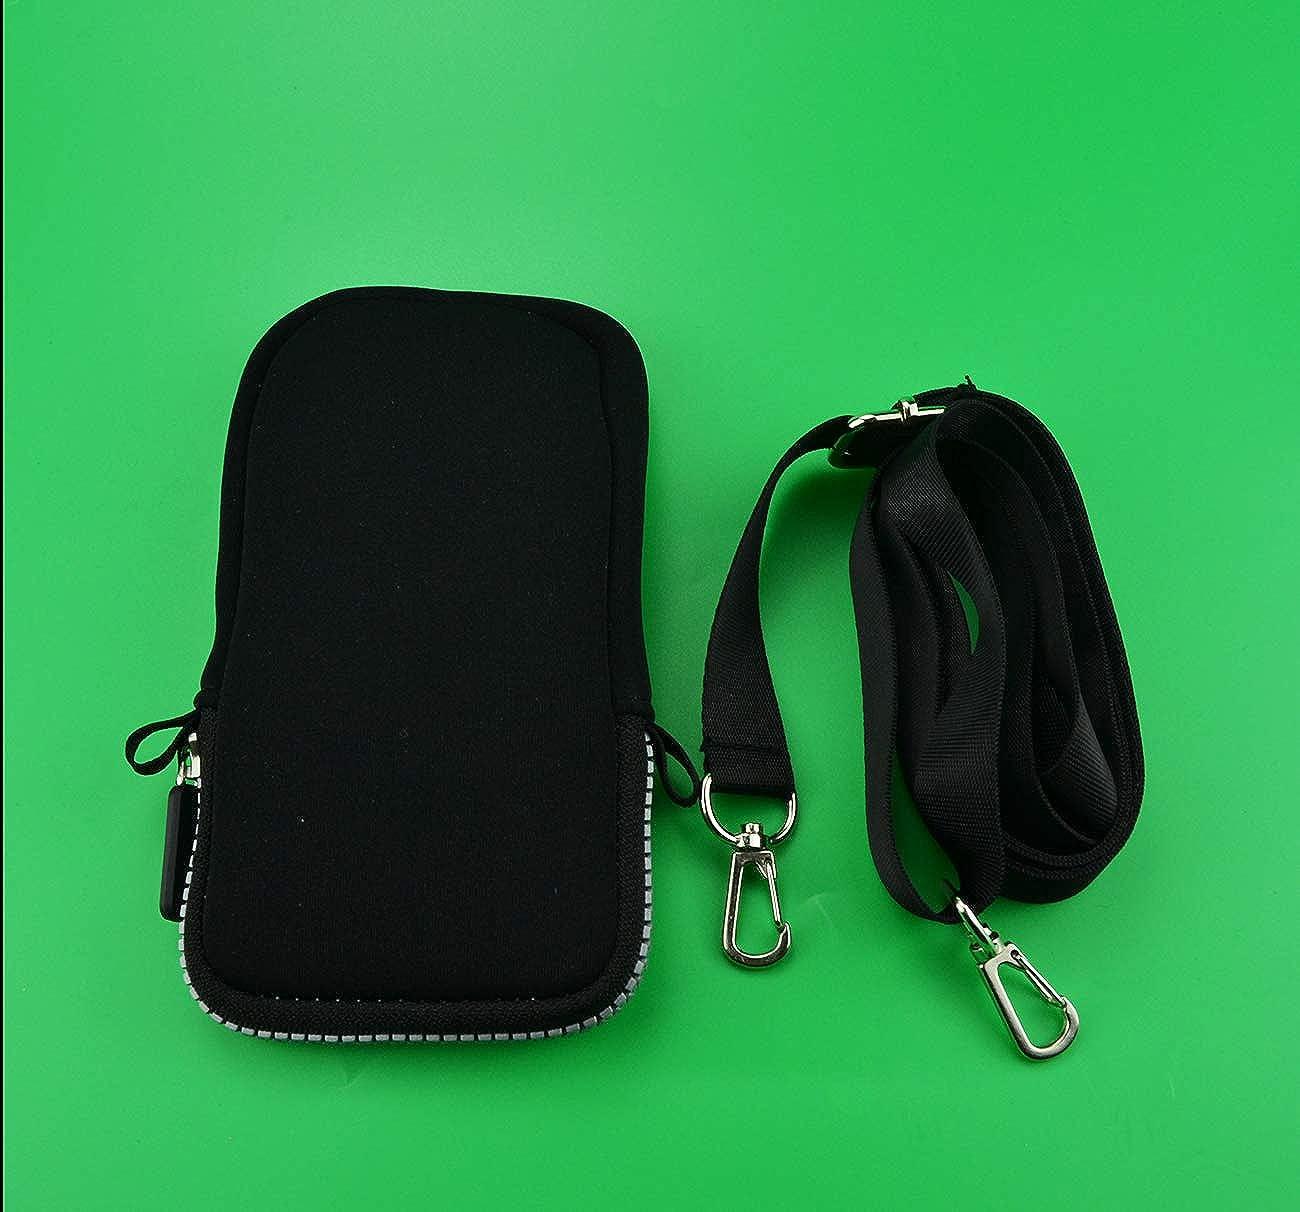 Storage Organizer Wristlet Cross Body Bag For 6 Inch Cell Phones with Adjustable Shoulder Strap Iphone Picnic Multipurpose Dark Skeleton Anatomy Neck Travel Wallet